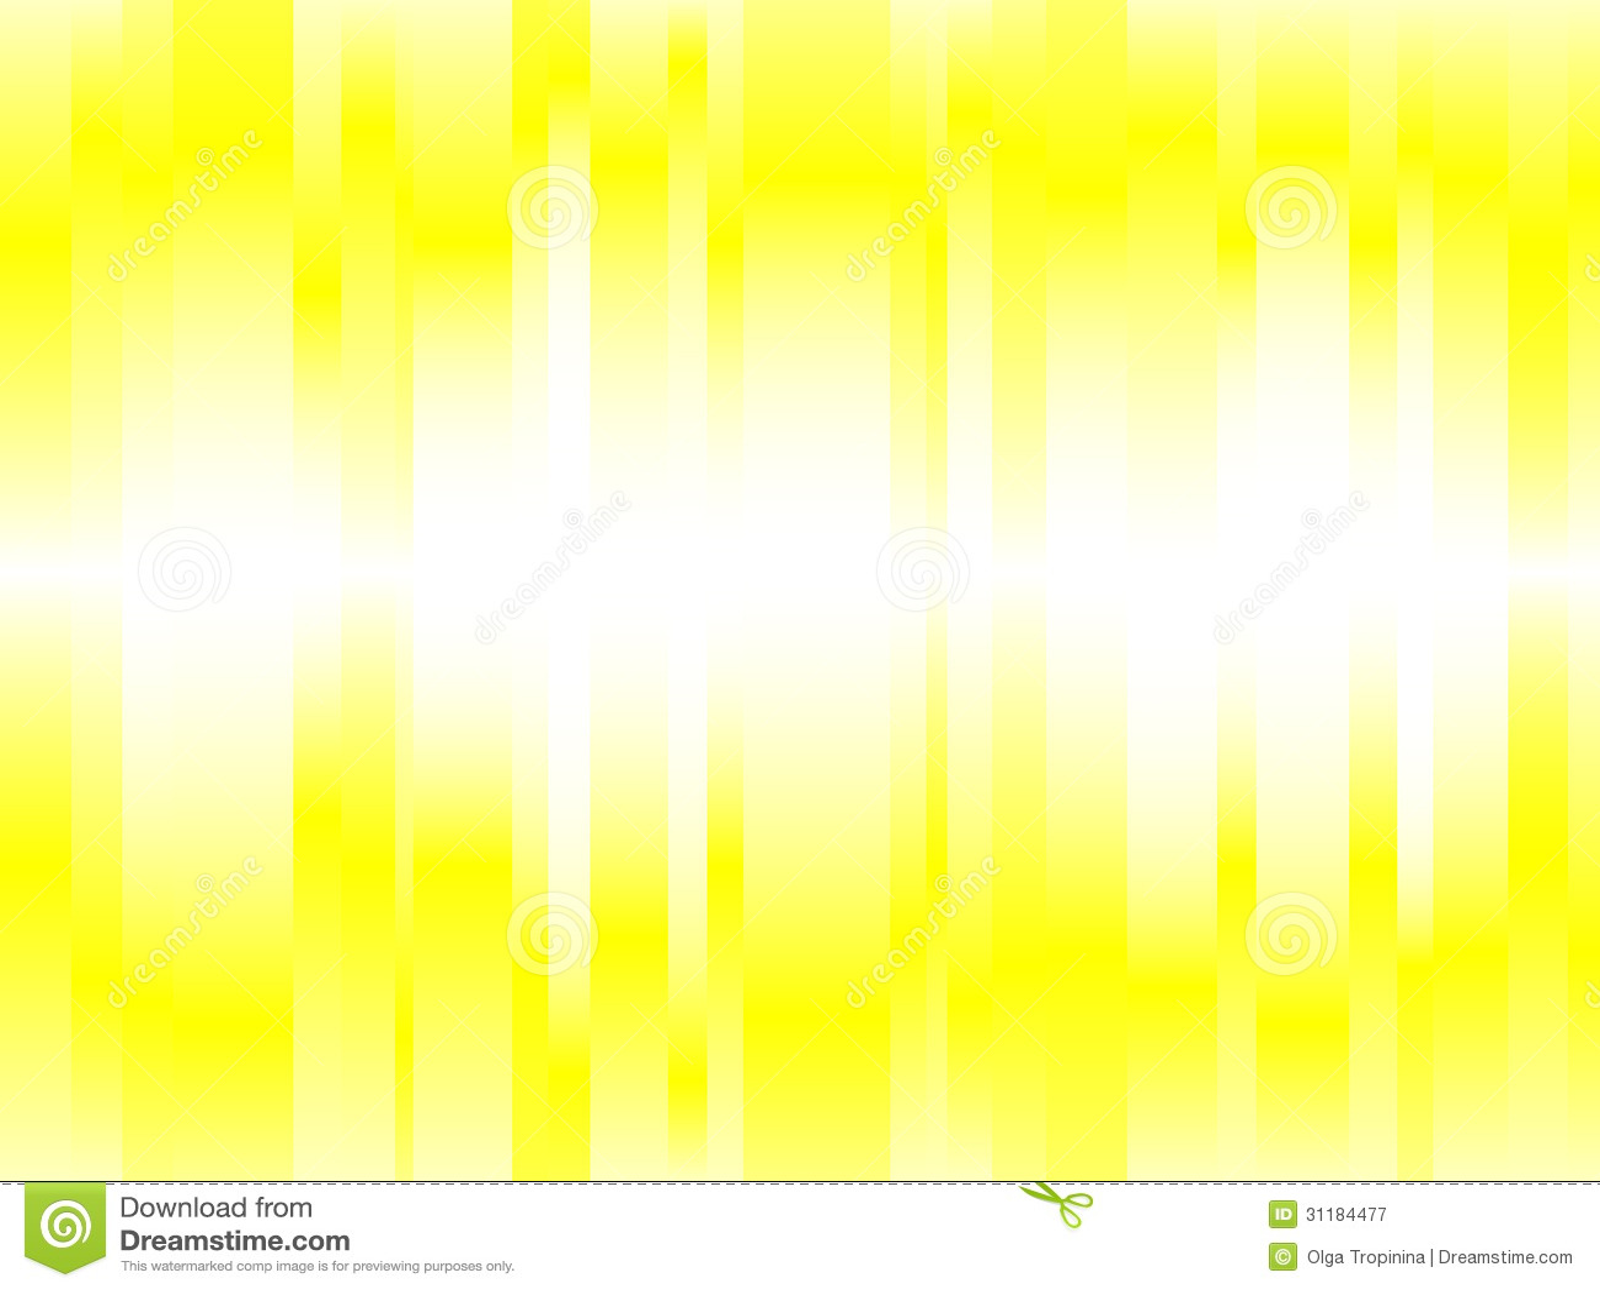 yellow rays vector - photo #32